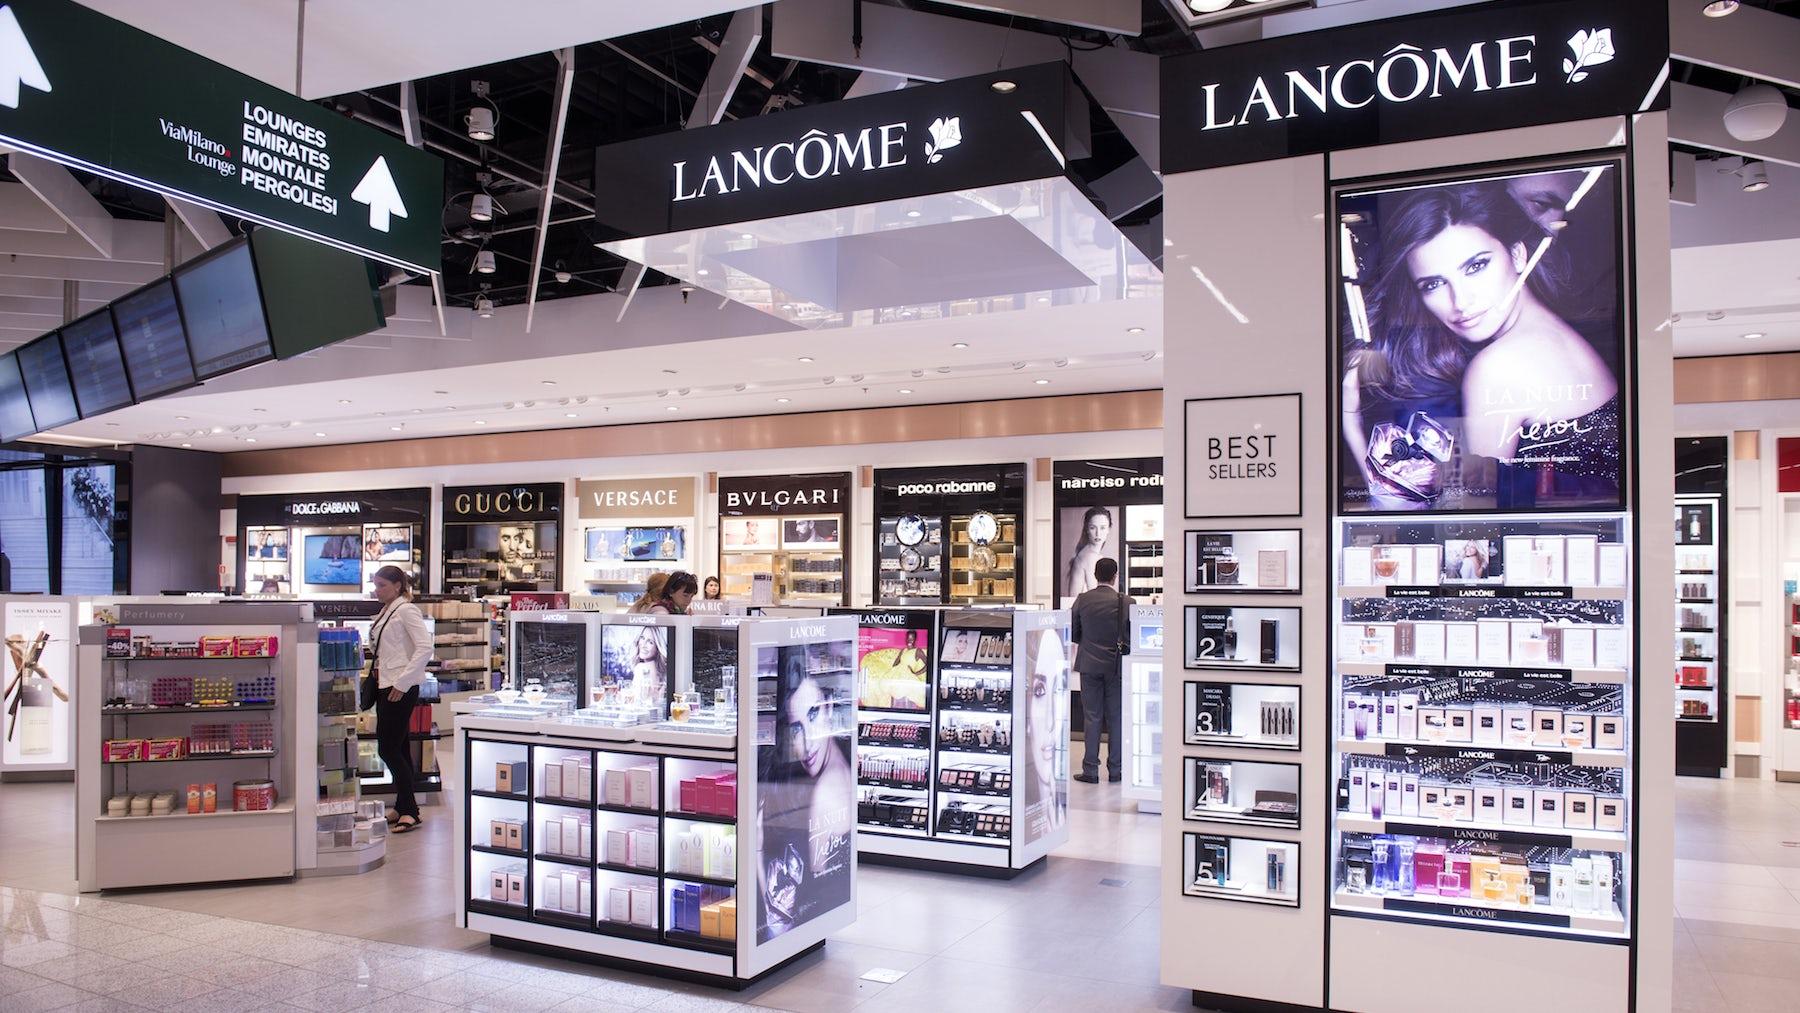 Lancôme booth | Source: Shutterstock